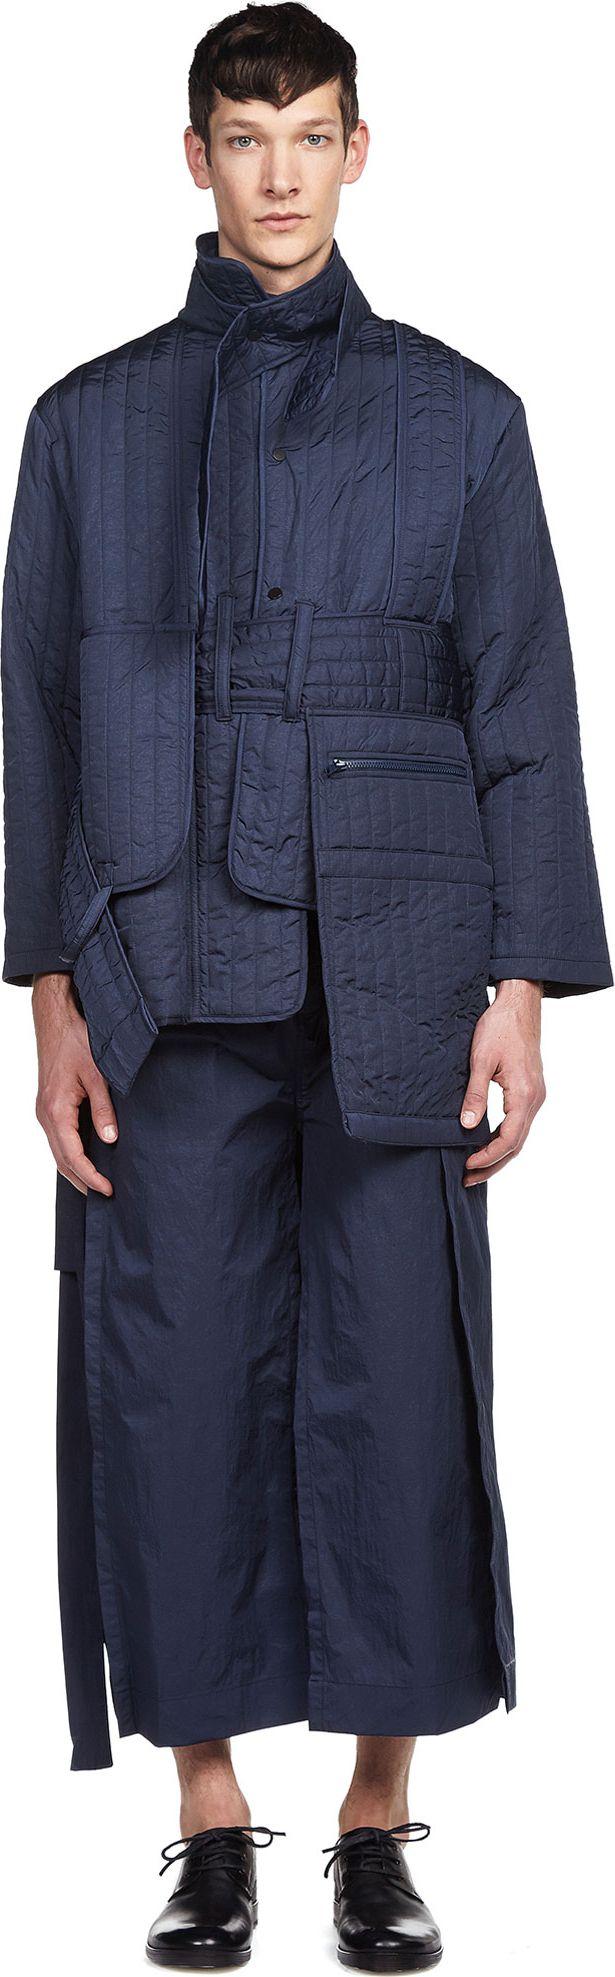 Quilted Ww Jacket Craig Green Loit Fashion Menswear Conceptual Fashion